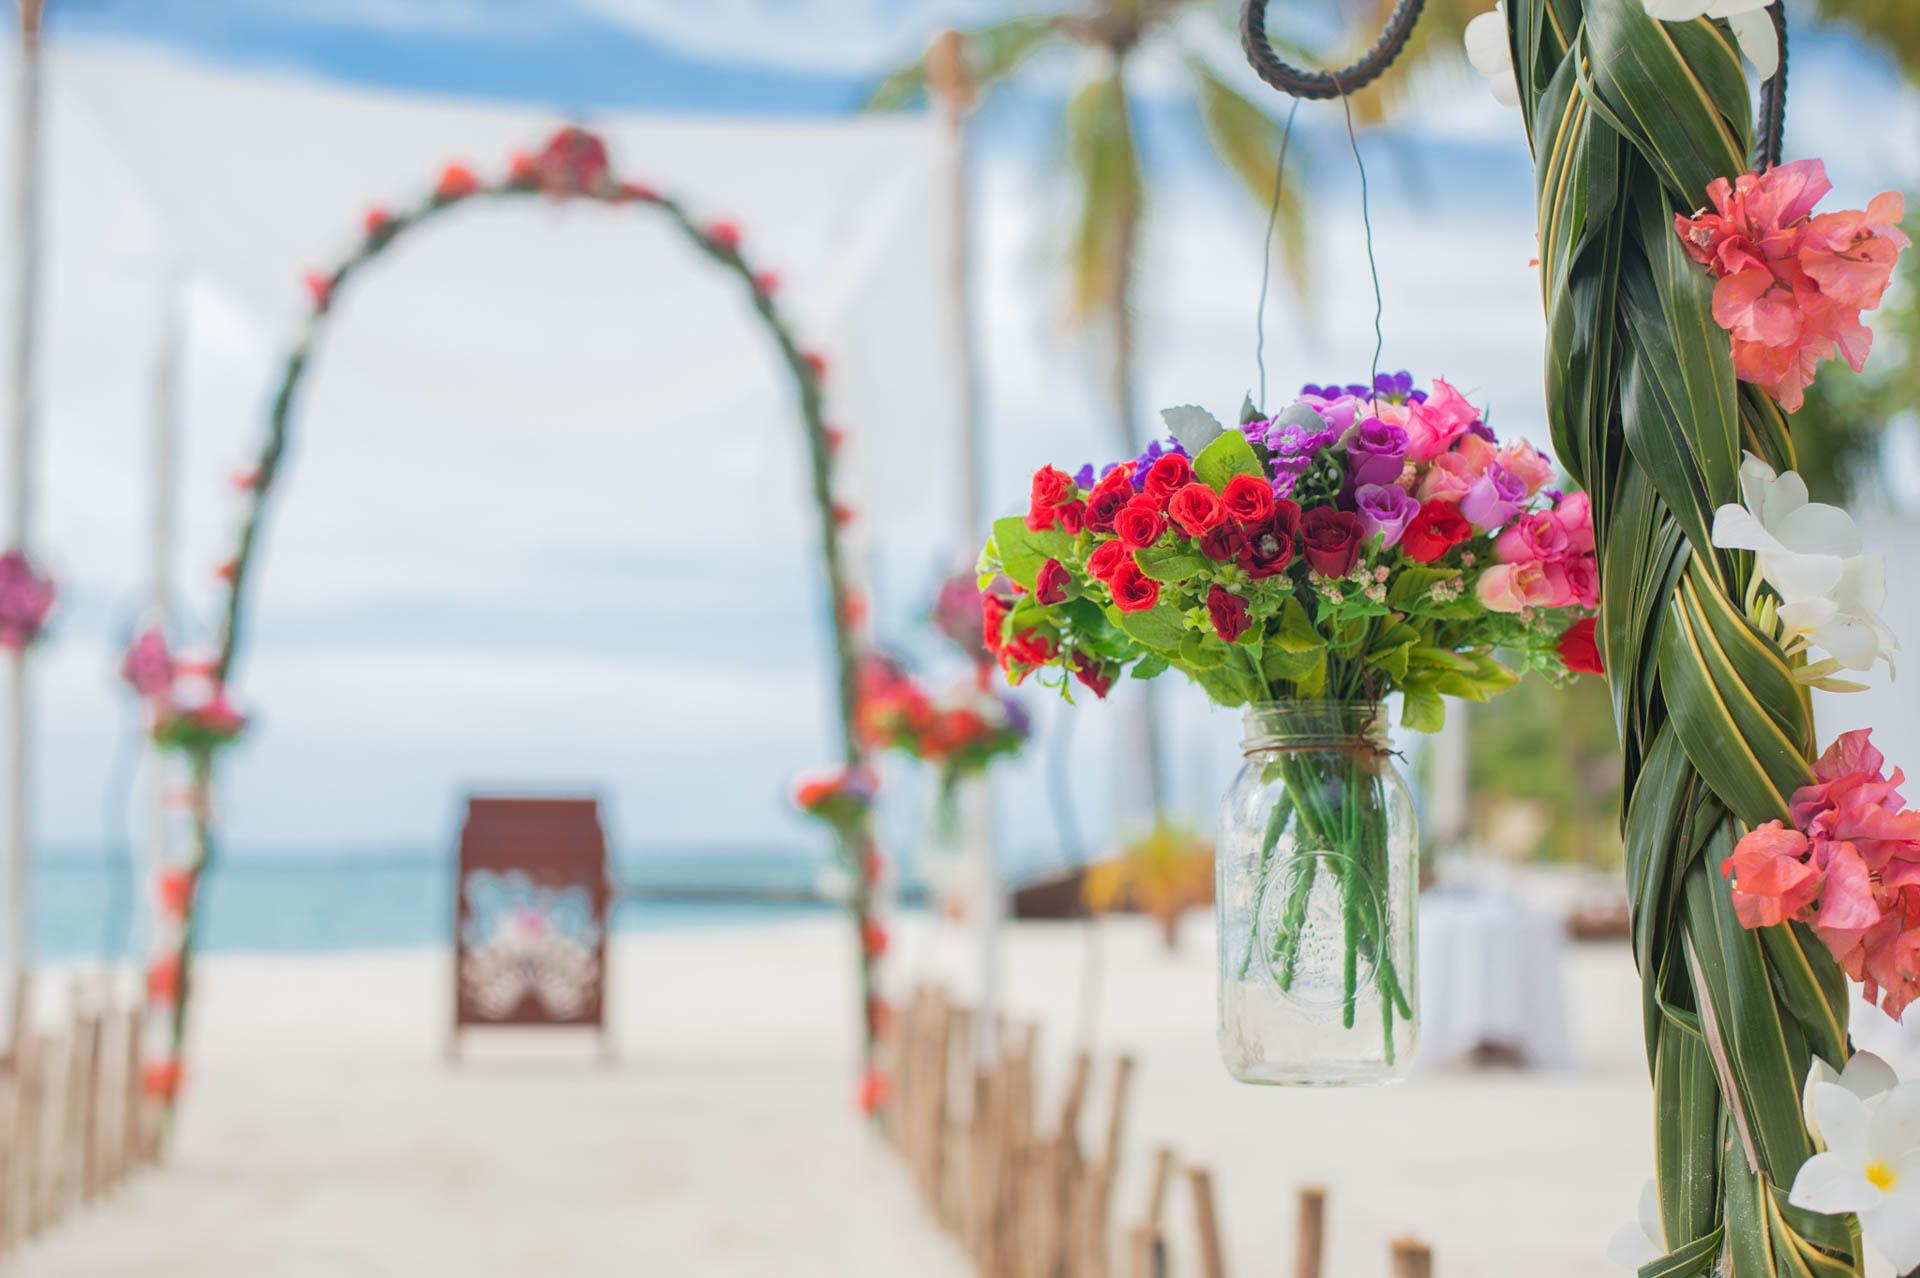 Chih Chao Yu Shan Destination Wedding at Residence Maldives 48